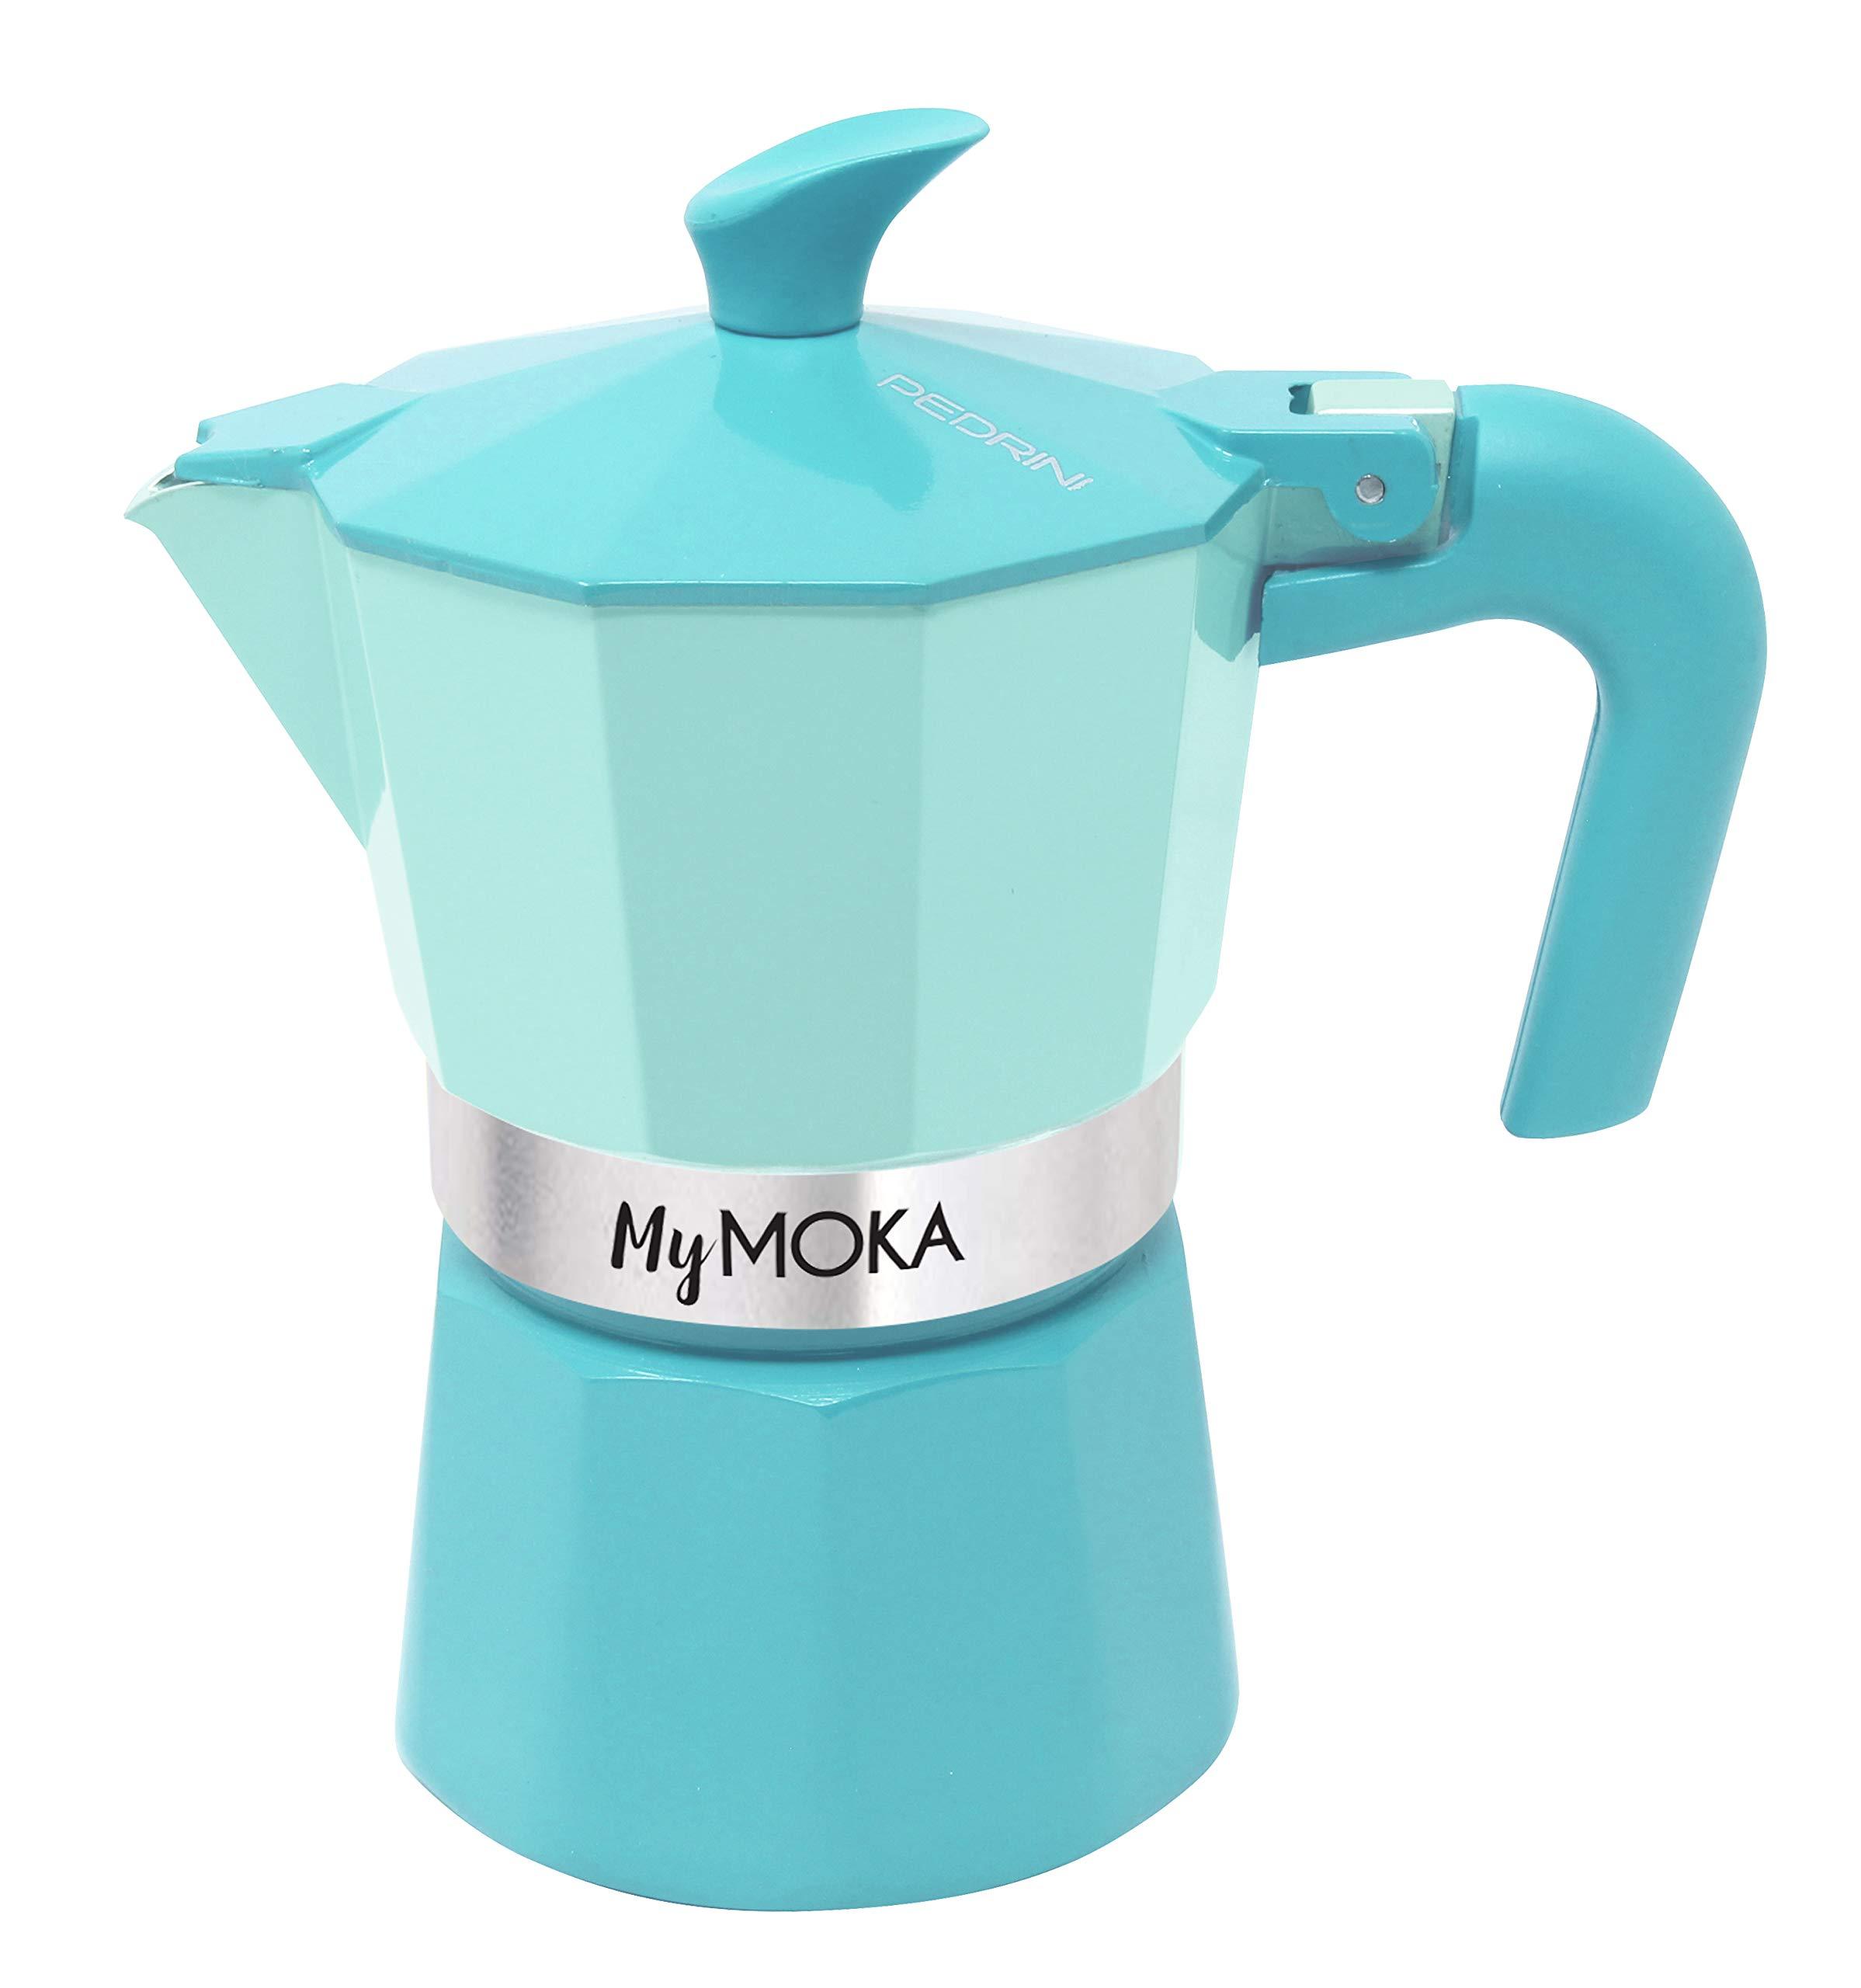 Pedrini mymoka Cafetera, beachblue: Amazon.es: Hogar